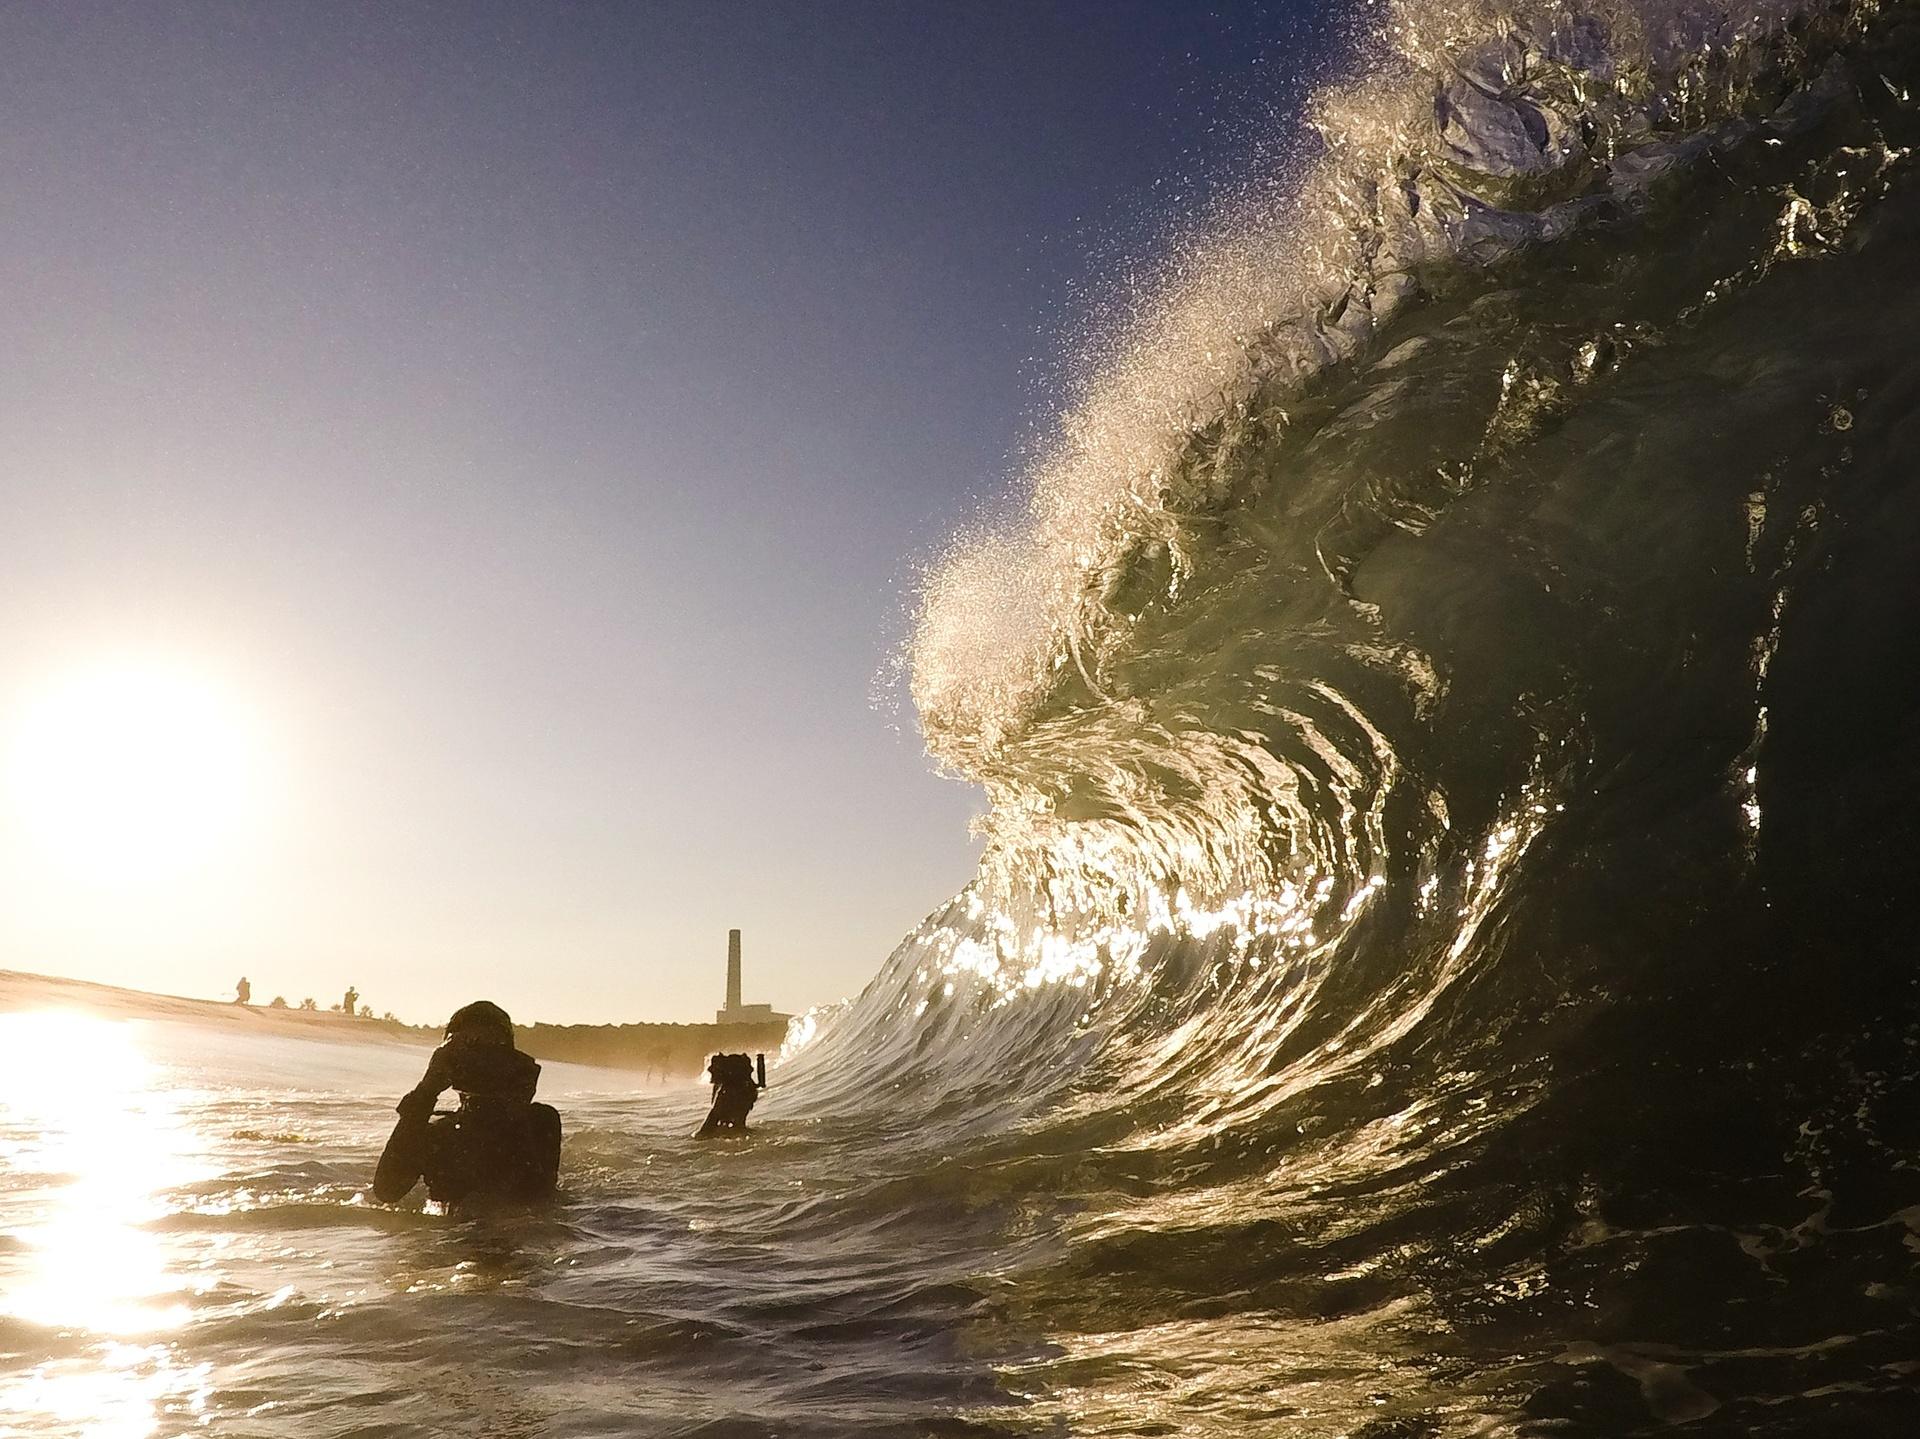 Ocean photographer's dream | andrewrio, water, surf, beach